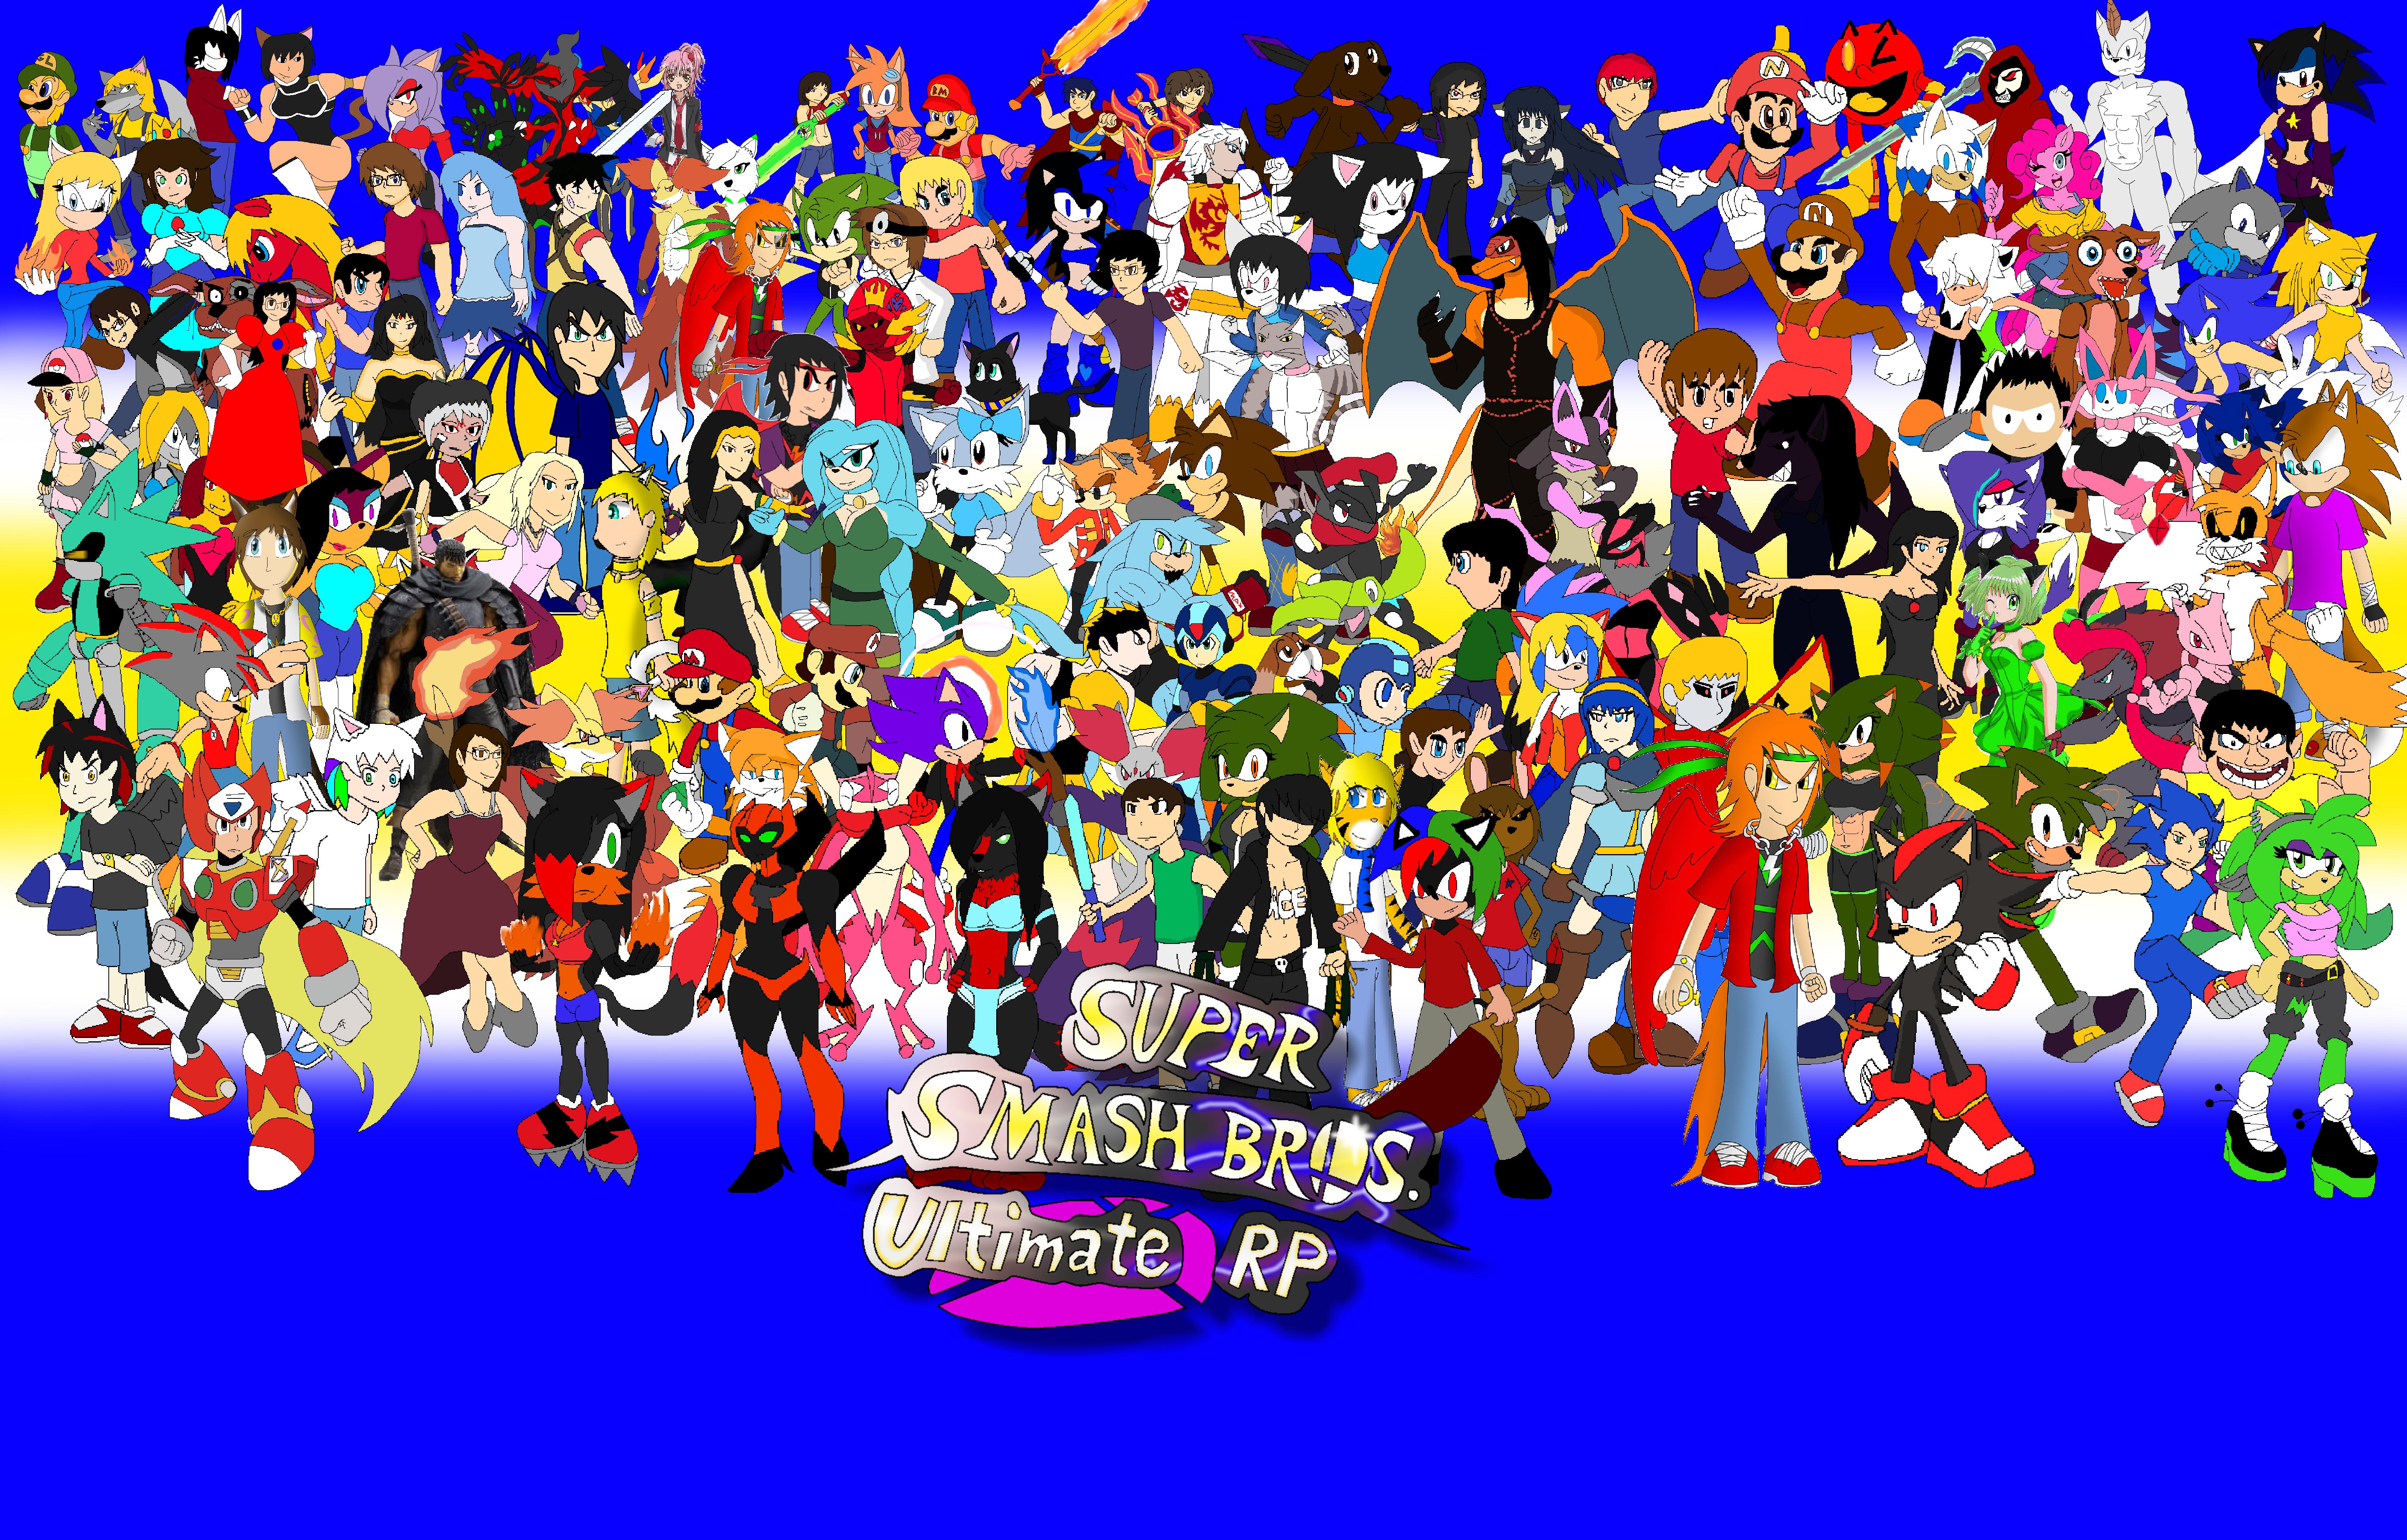 Super Smash Bros Tournaments In Rhode Island  November